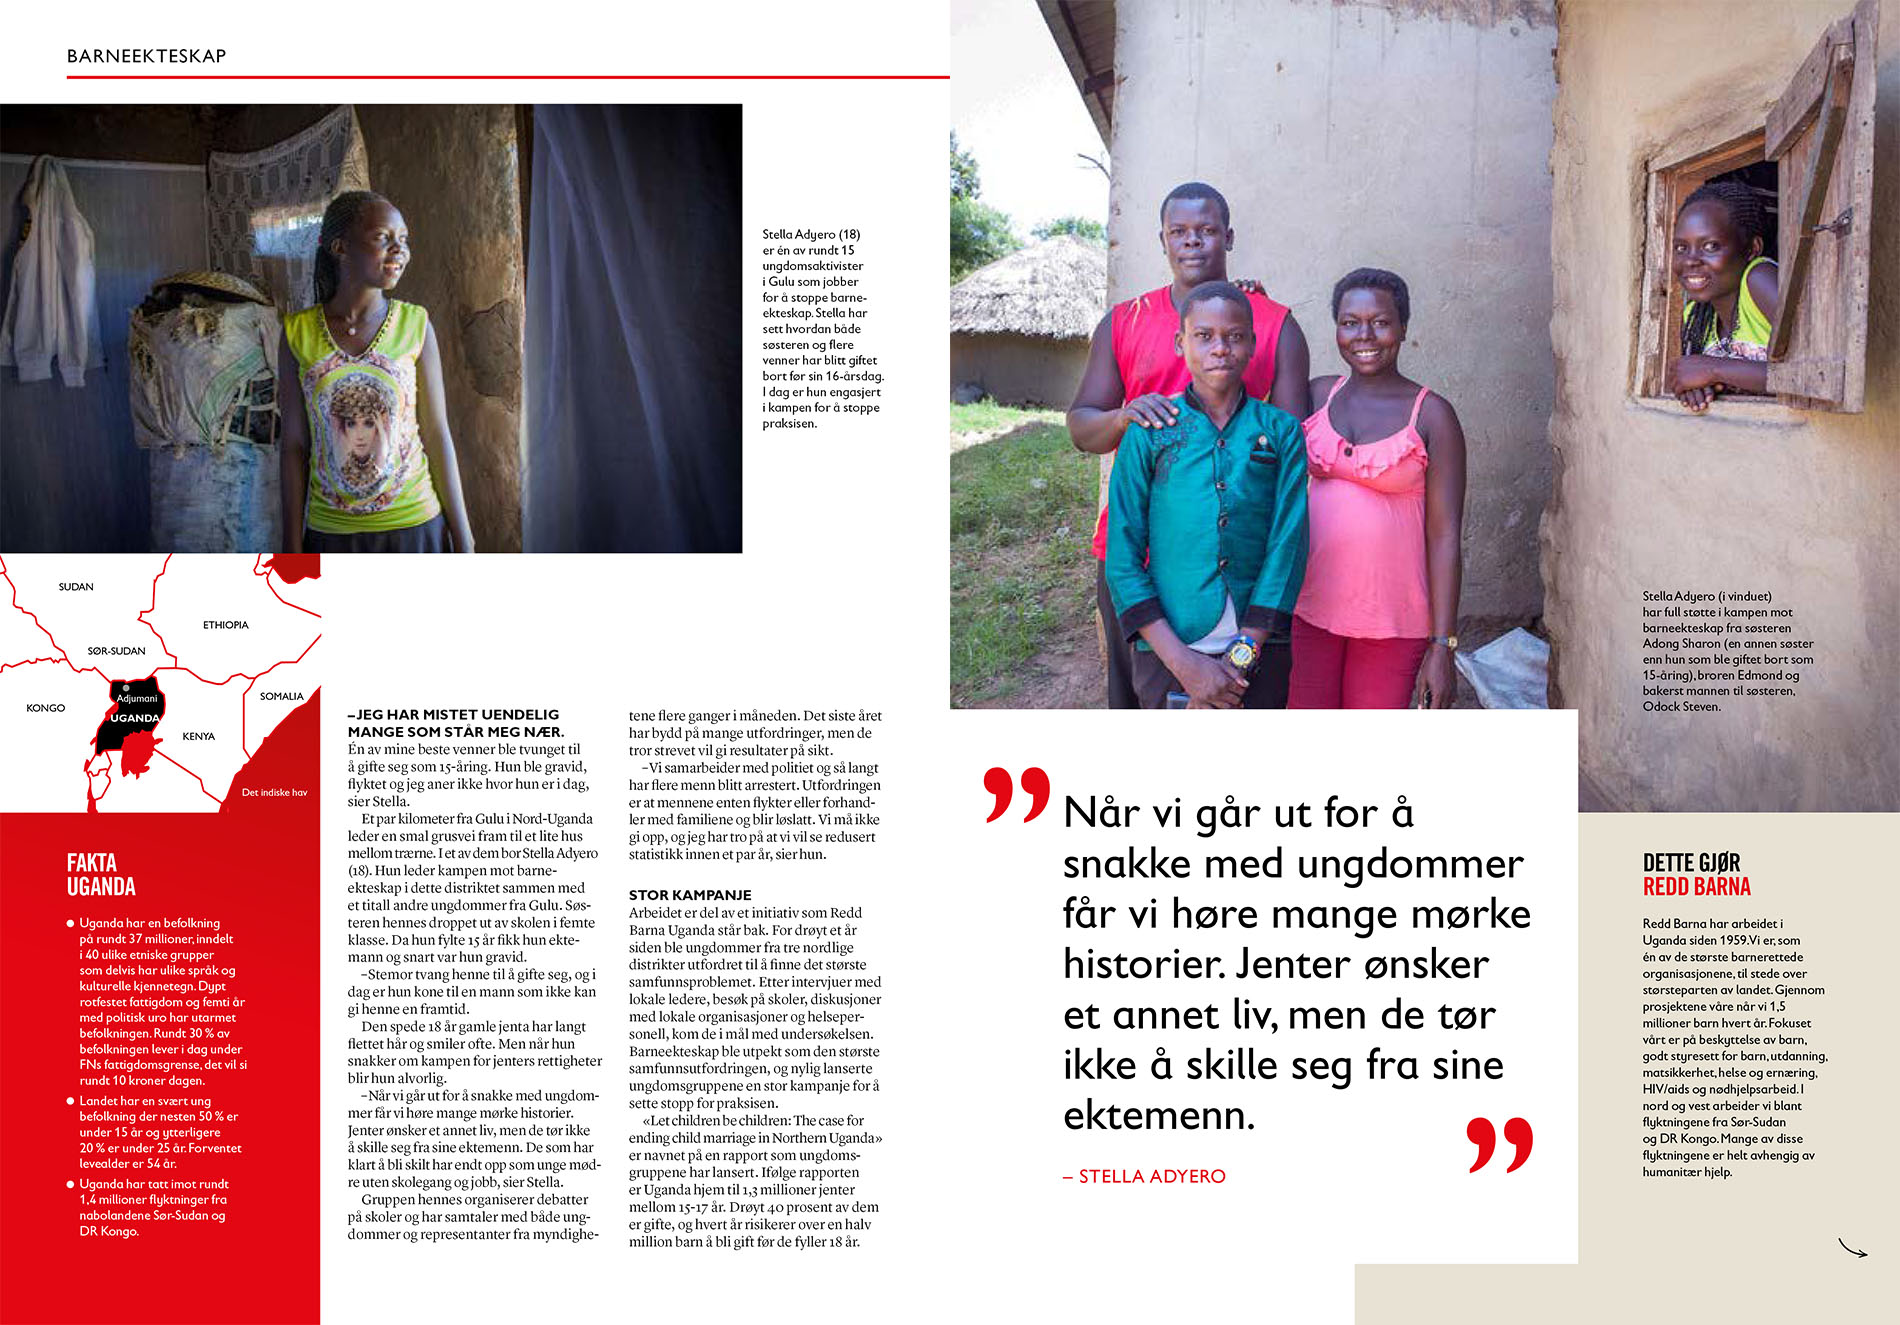 Child marriage in Northern Uganda